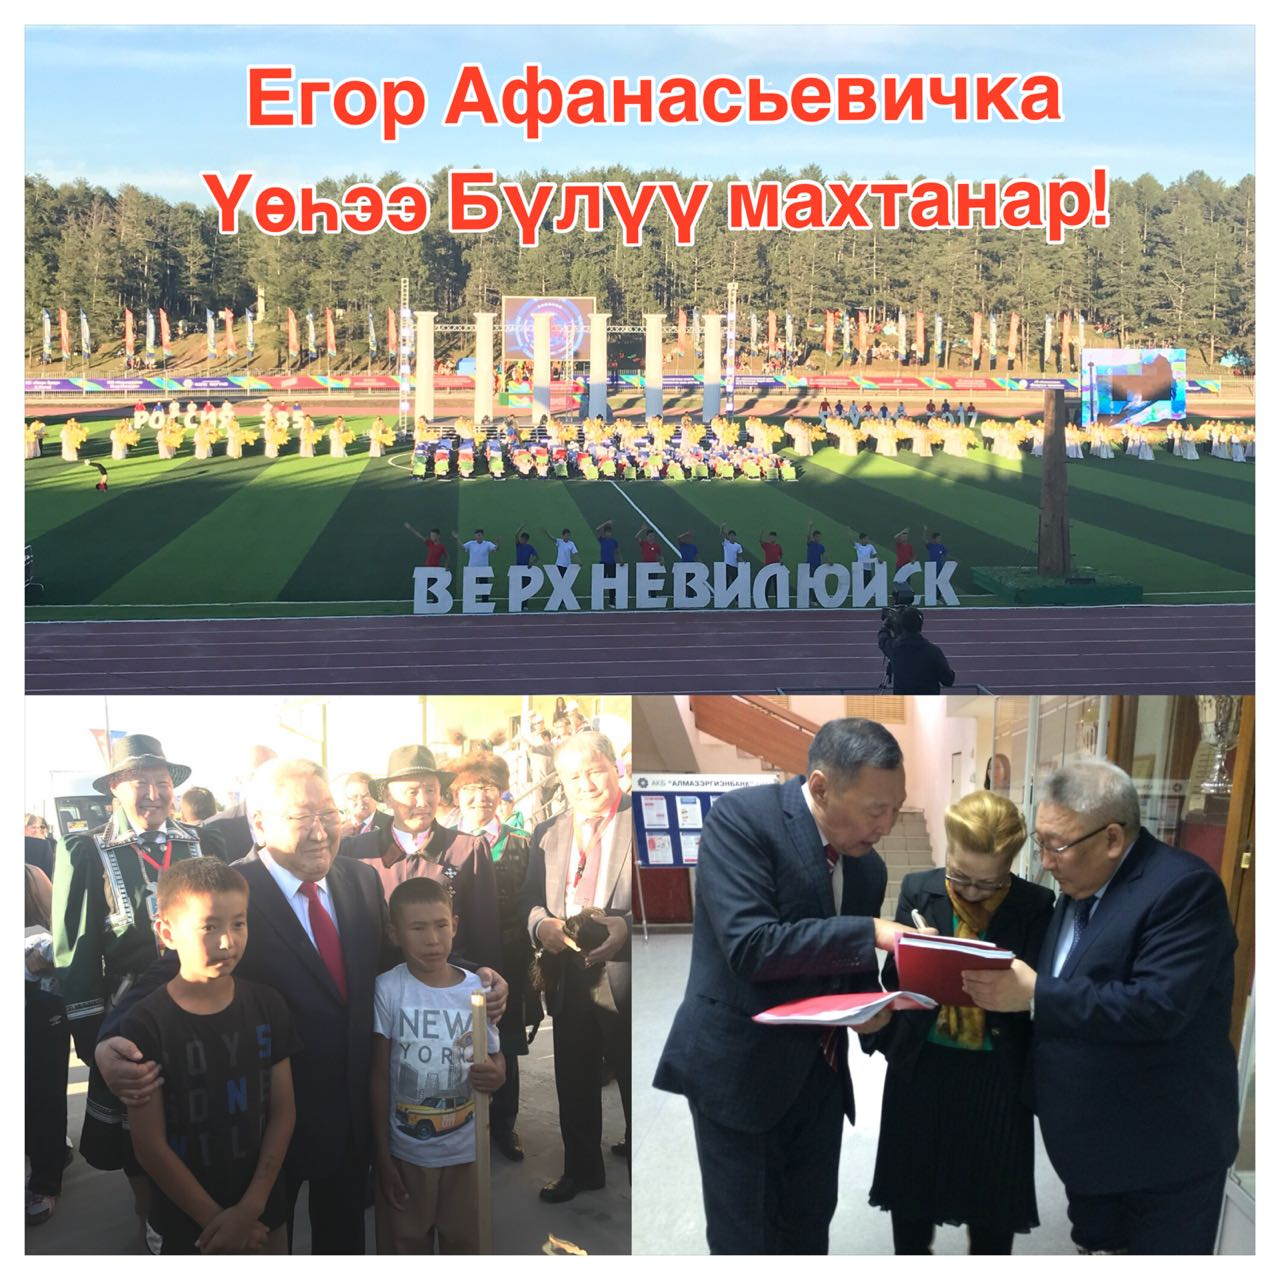 Владимир ПОСКАЧИН: «Егор Афанасьевич Борисов дьиҥ саха салайааччыта»